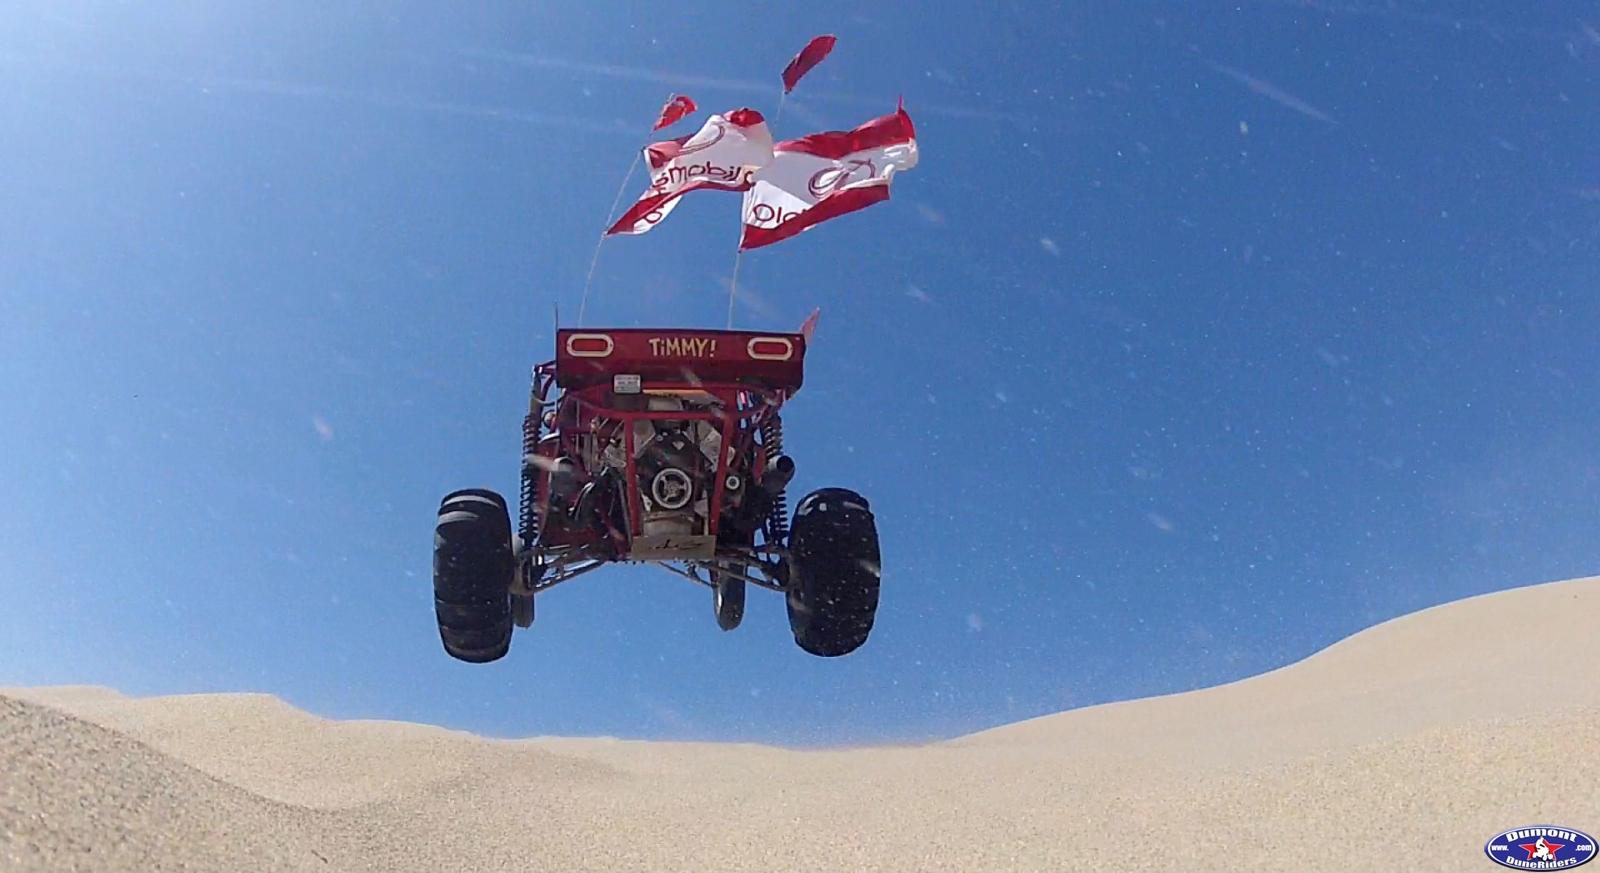 timmy jumping at Taladega! Go Pro!